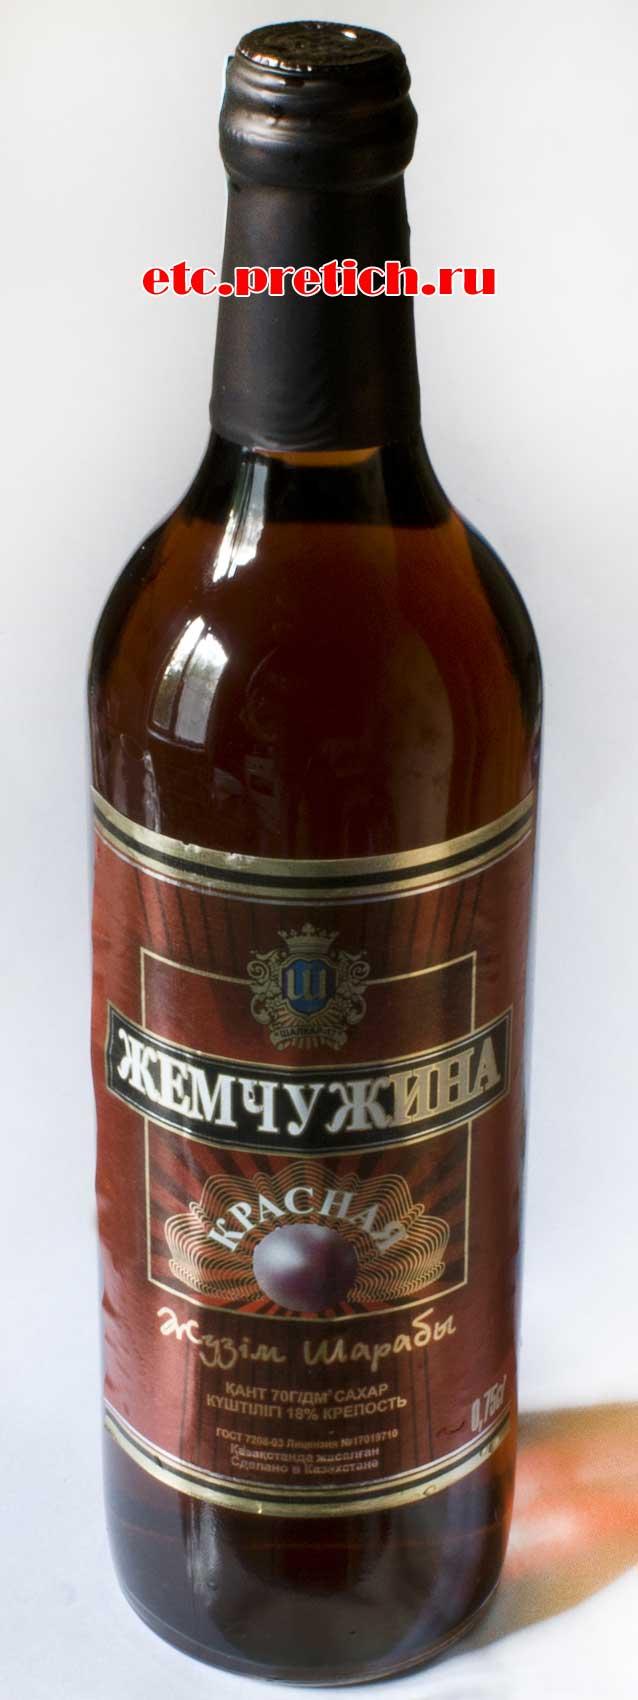 Жемчужина - вино Шалкар-17 отзыв о дешевом